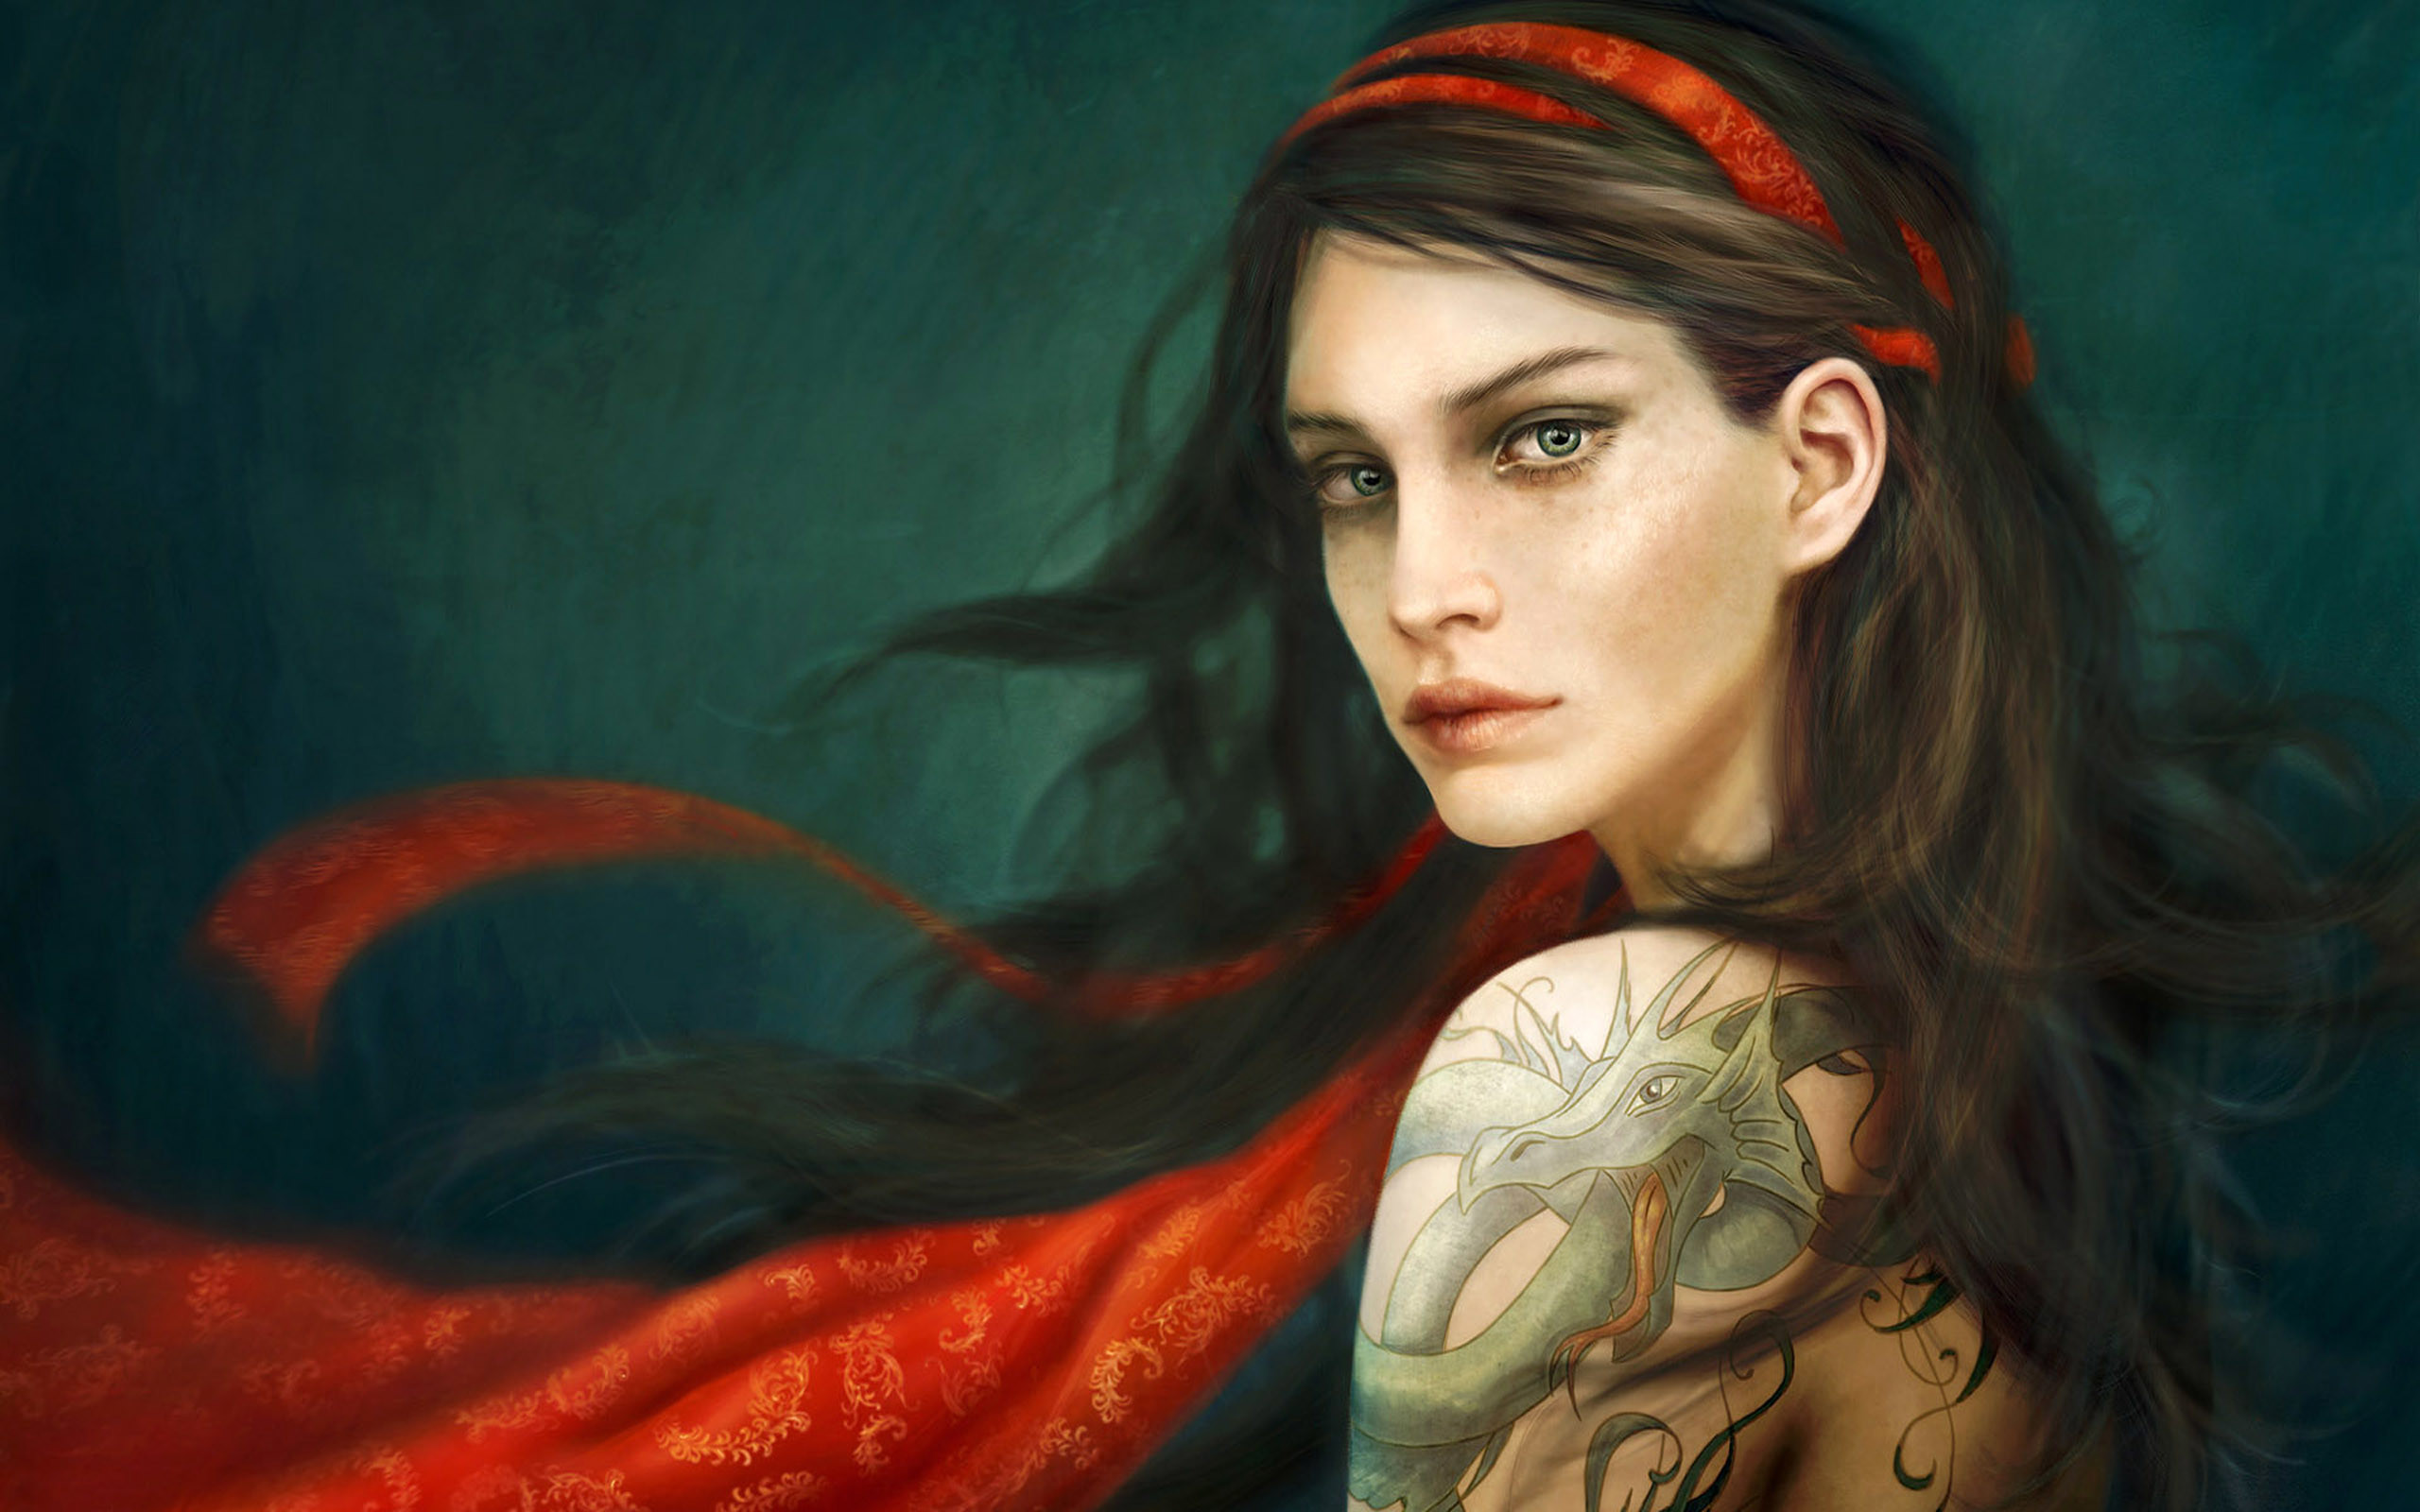 2 Fantasy Woman Wallpaper. 2 Fantasy Woman